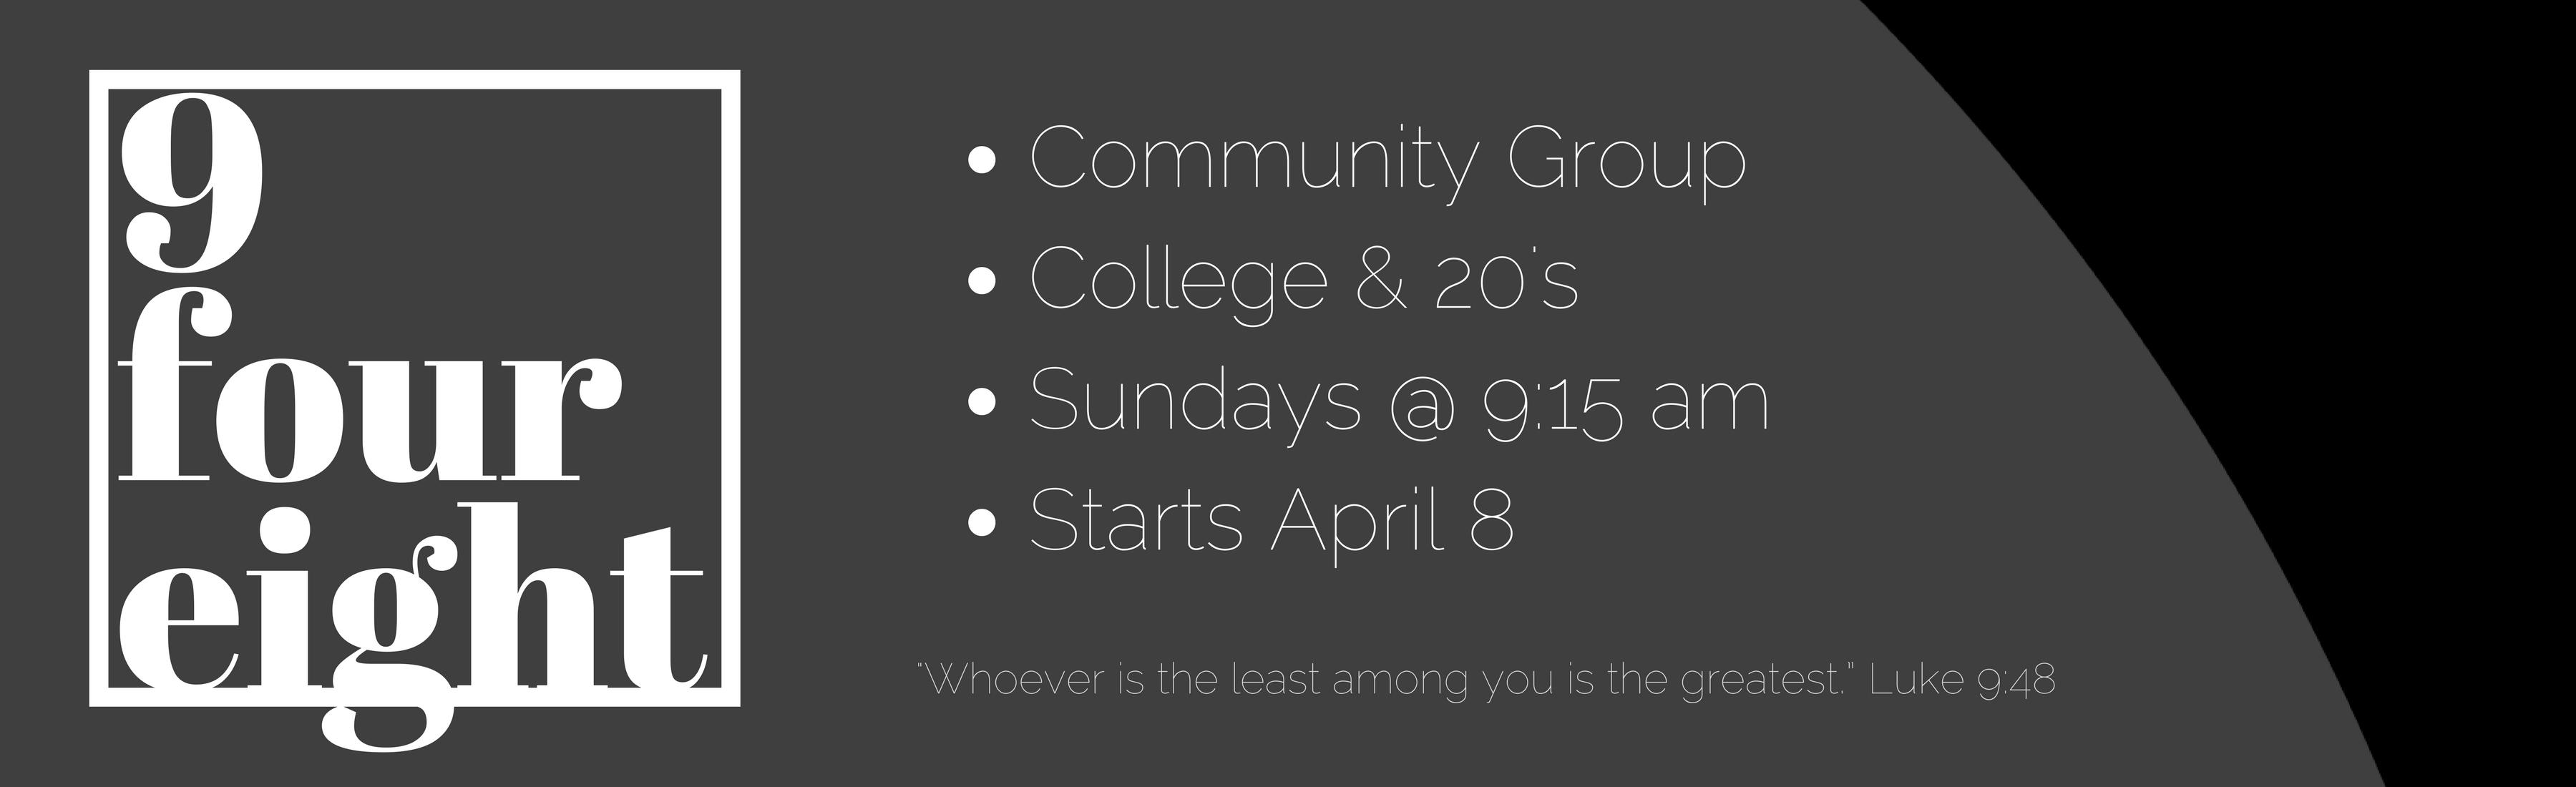 948 Community Group Slider 3600x1100